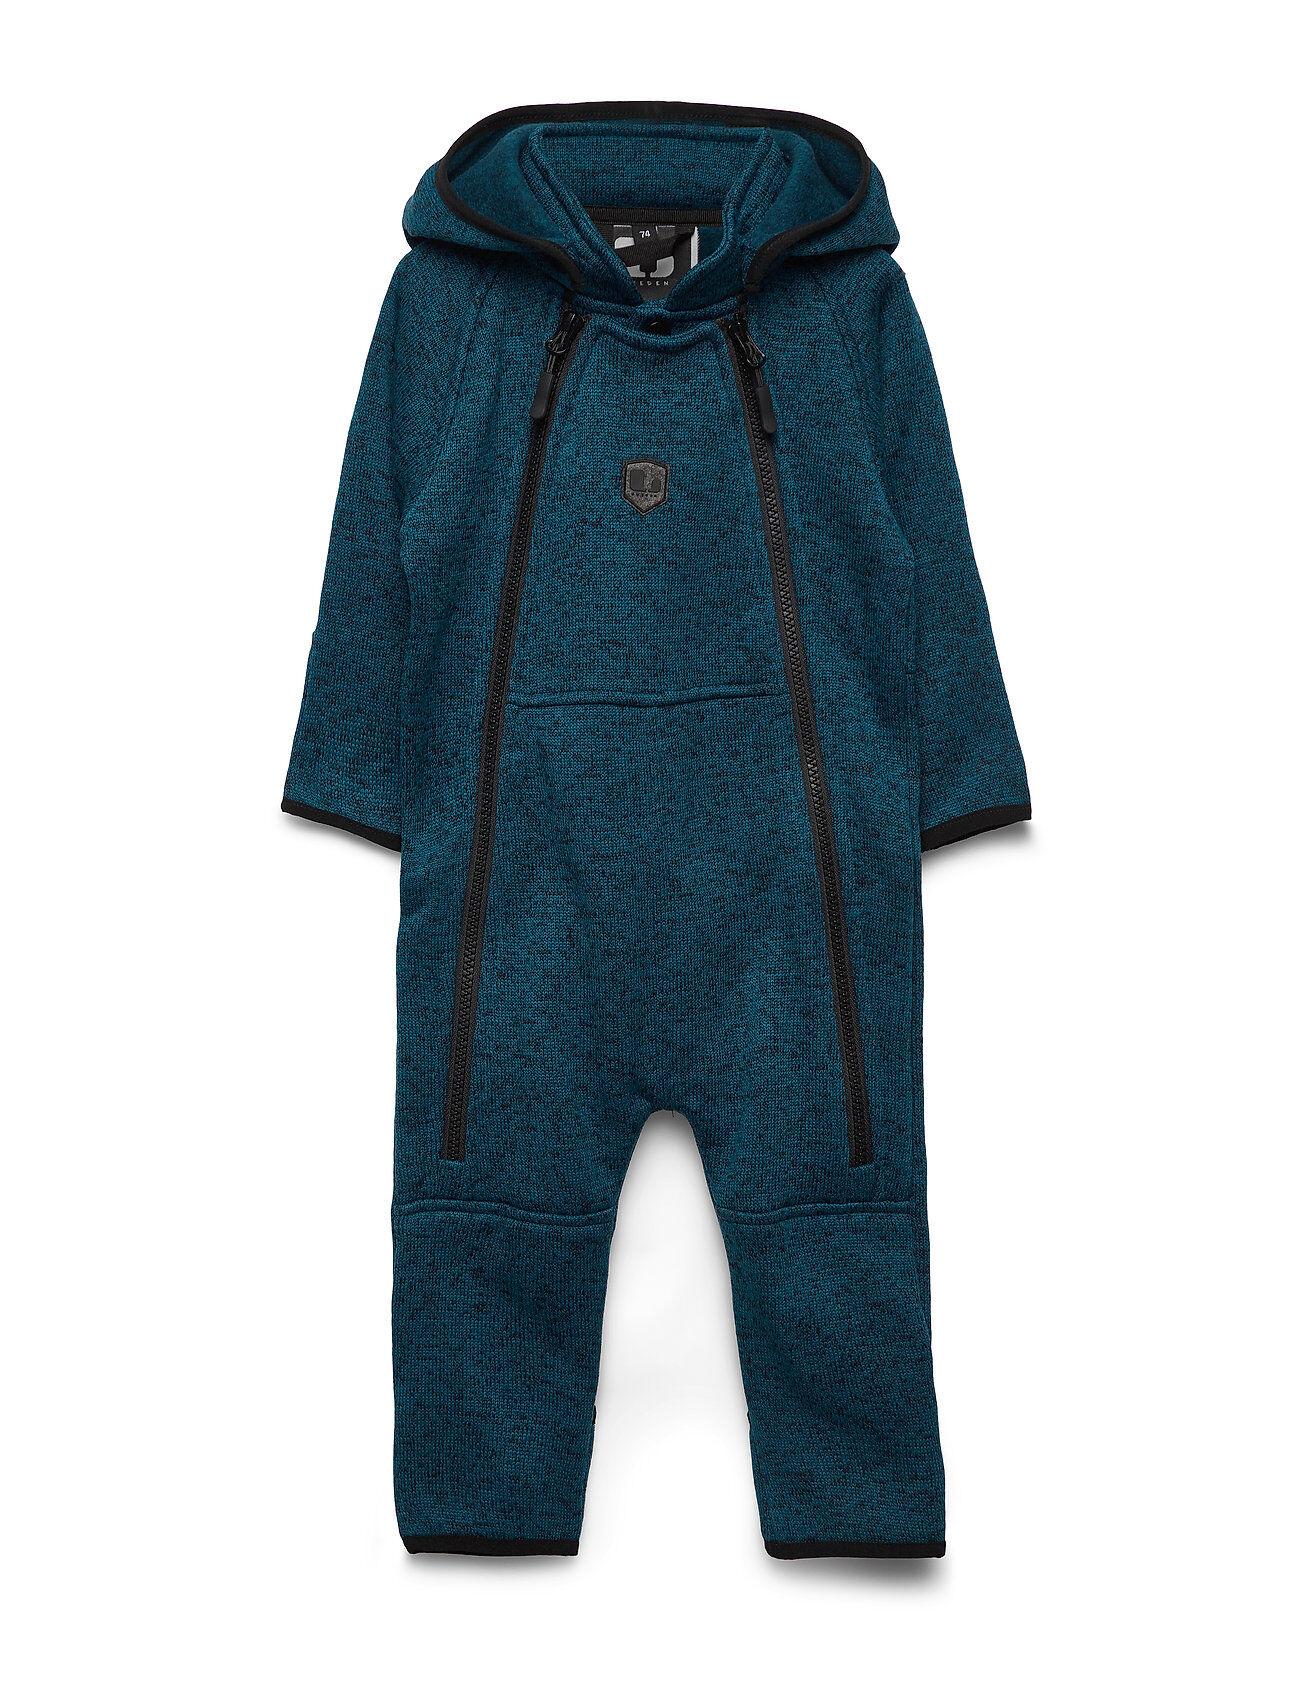 Lindberg Sweden Bormio Baby Overall Outerwear Fleece Outerwear Fleece Suits Sininen Lindberg Sweden